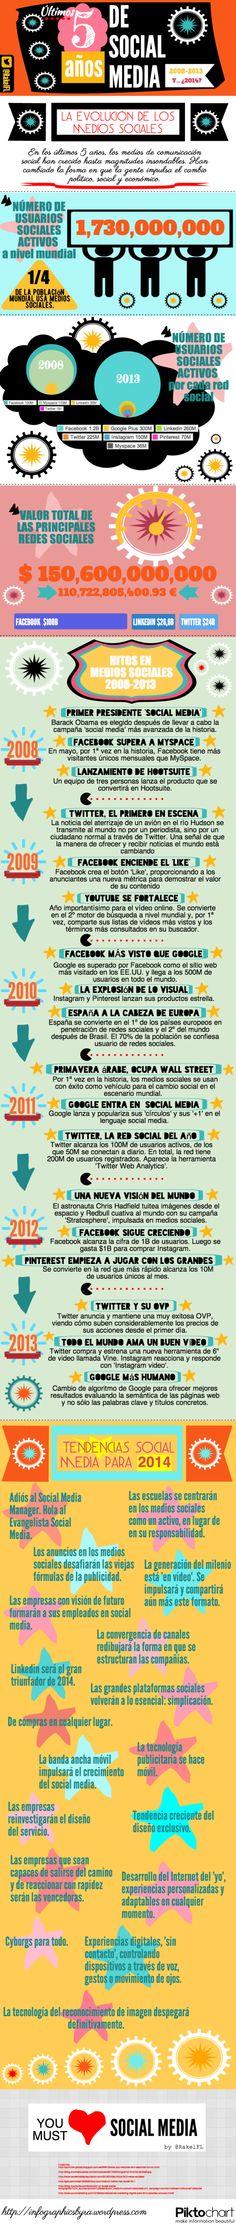 Redes Sociales 2008-2014 #infografia #infographic #socialmedia